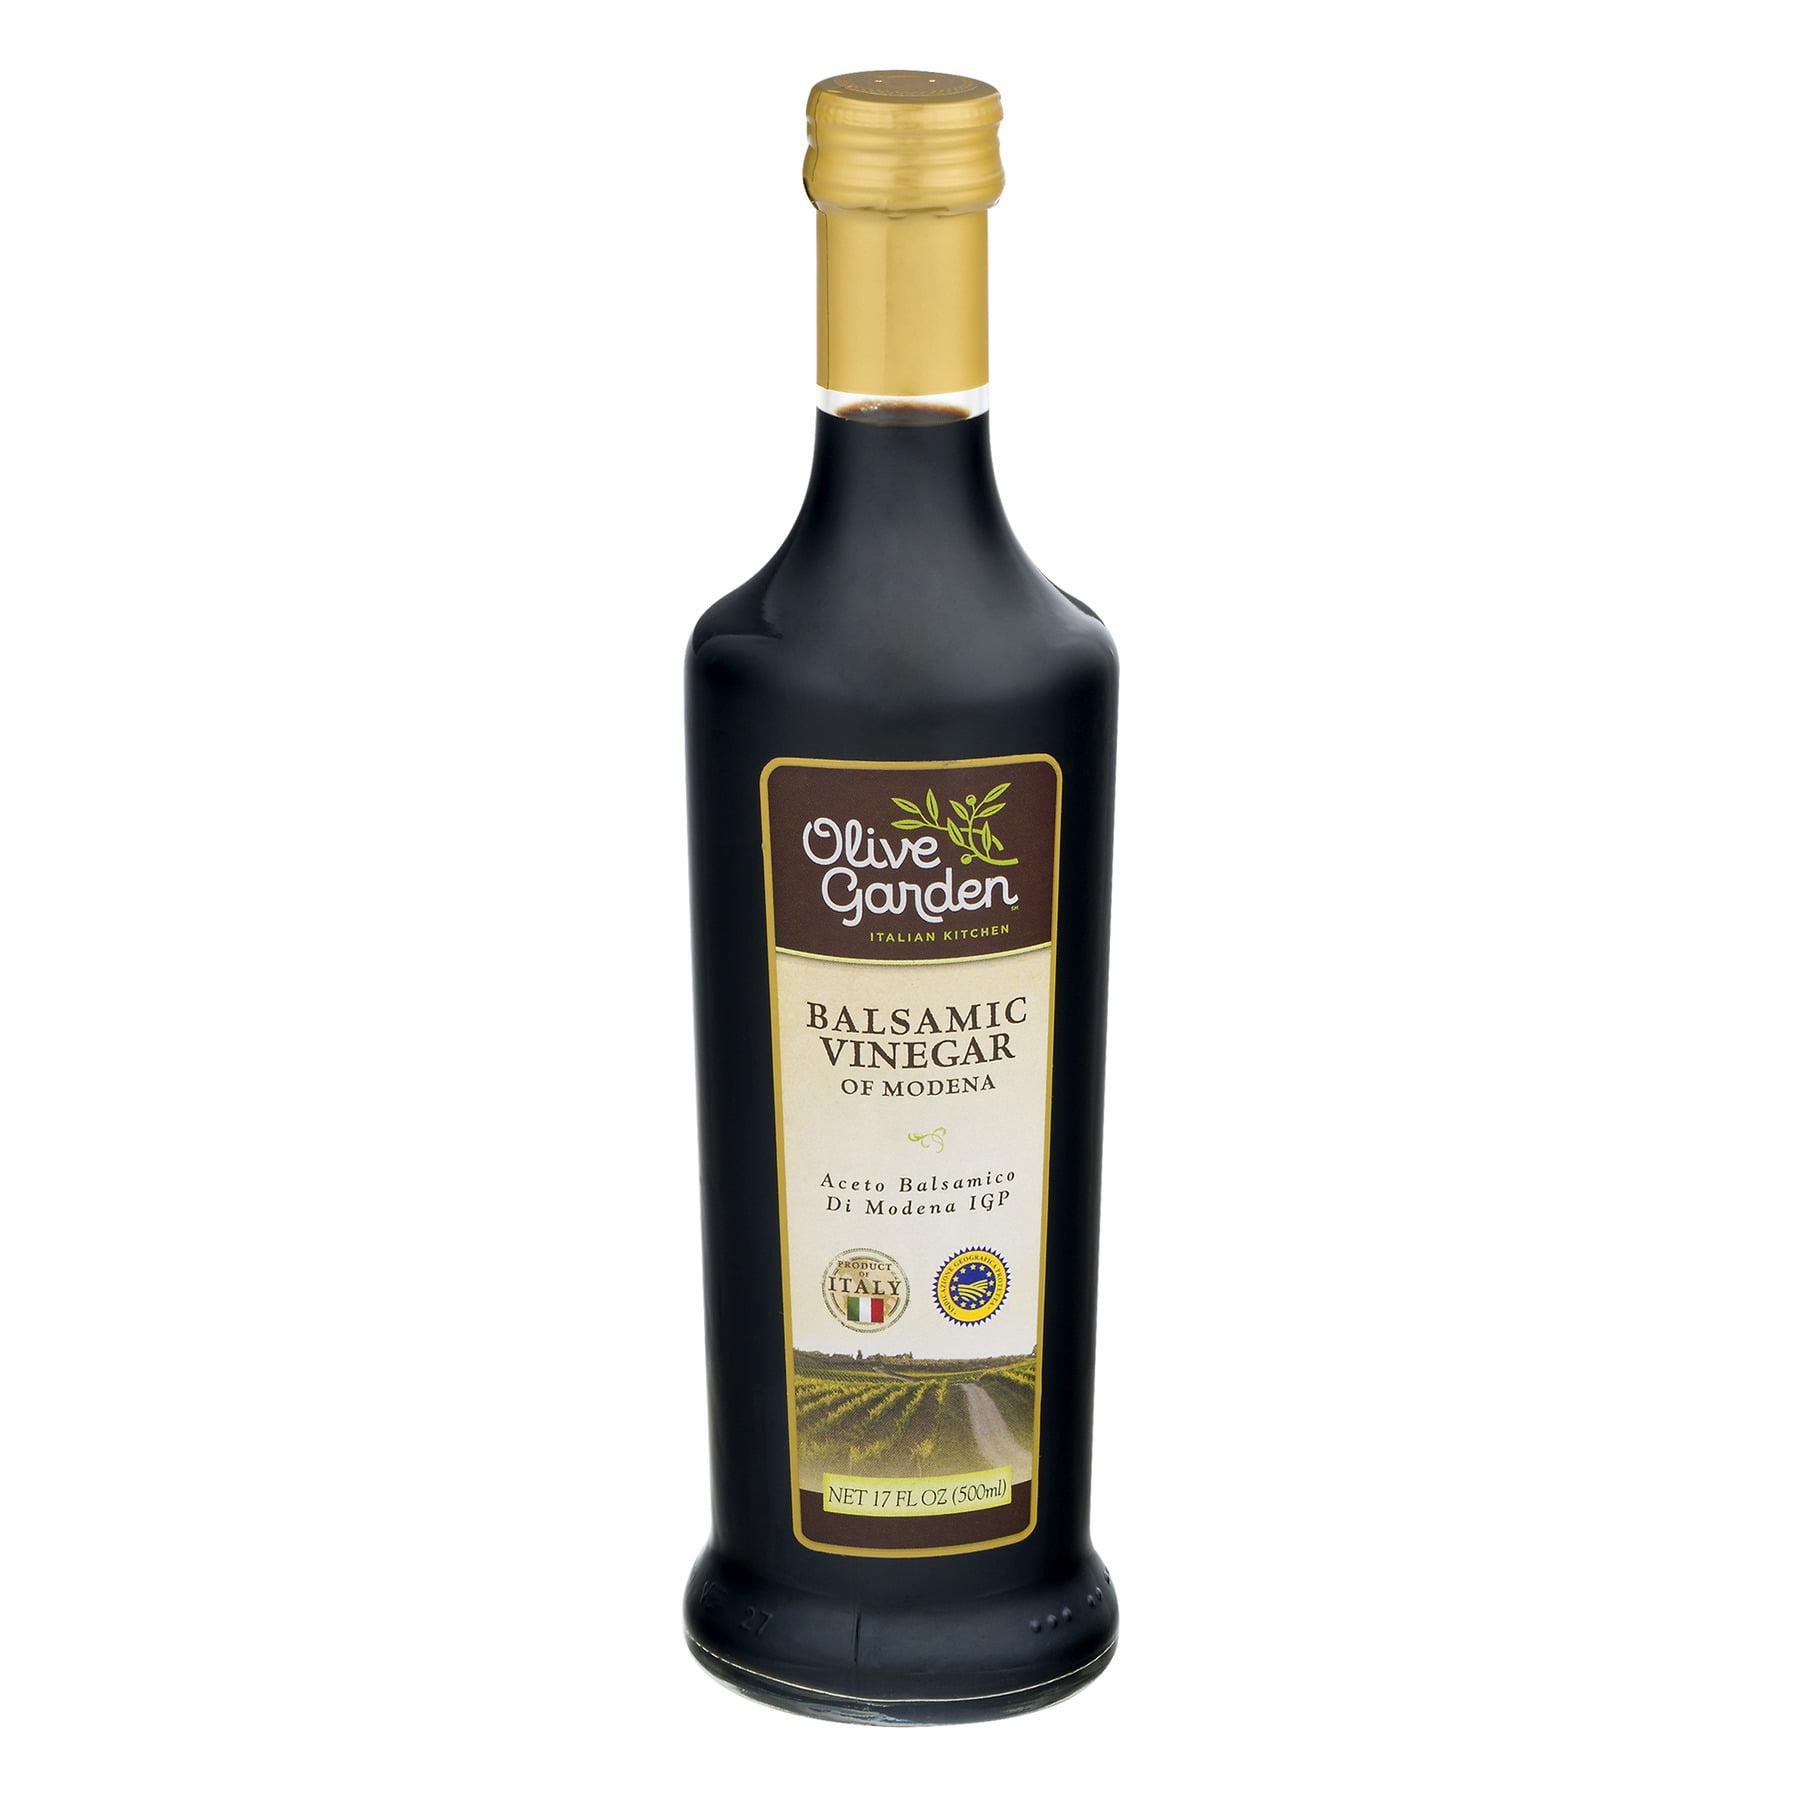 Olive Garden Balsamic Vinegar of Modena, 17 fl oz - Walmart.com